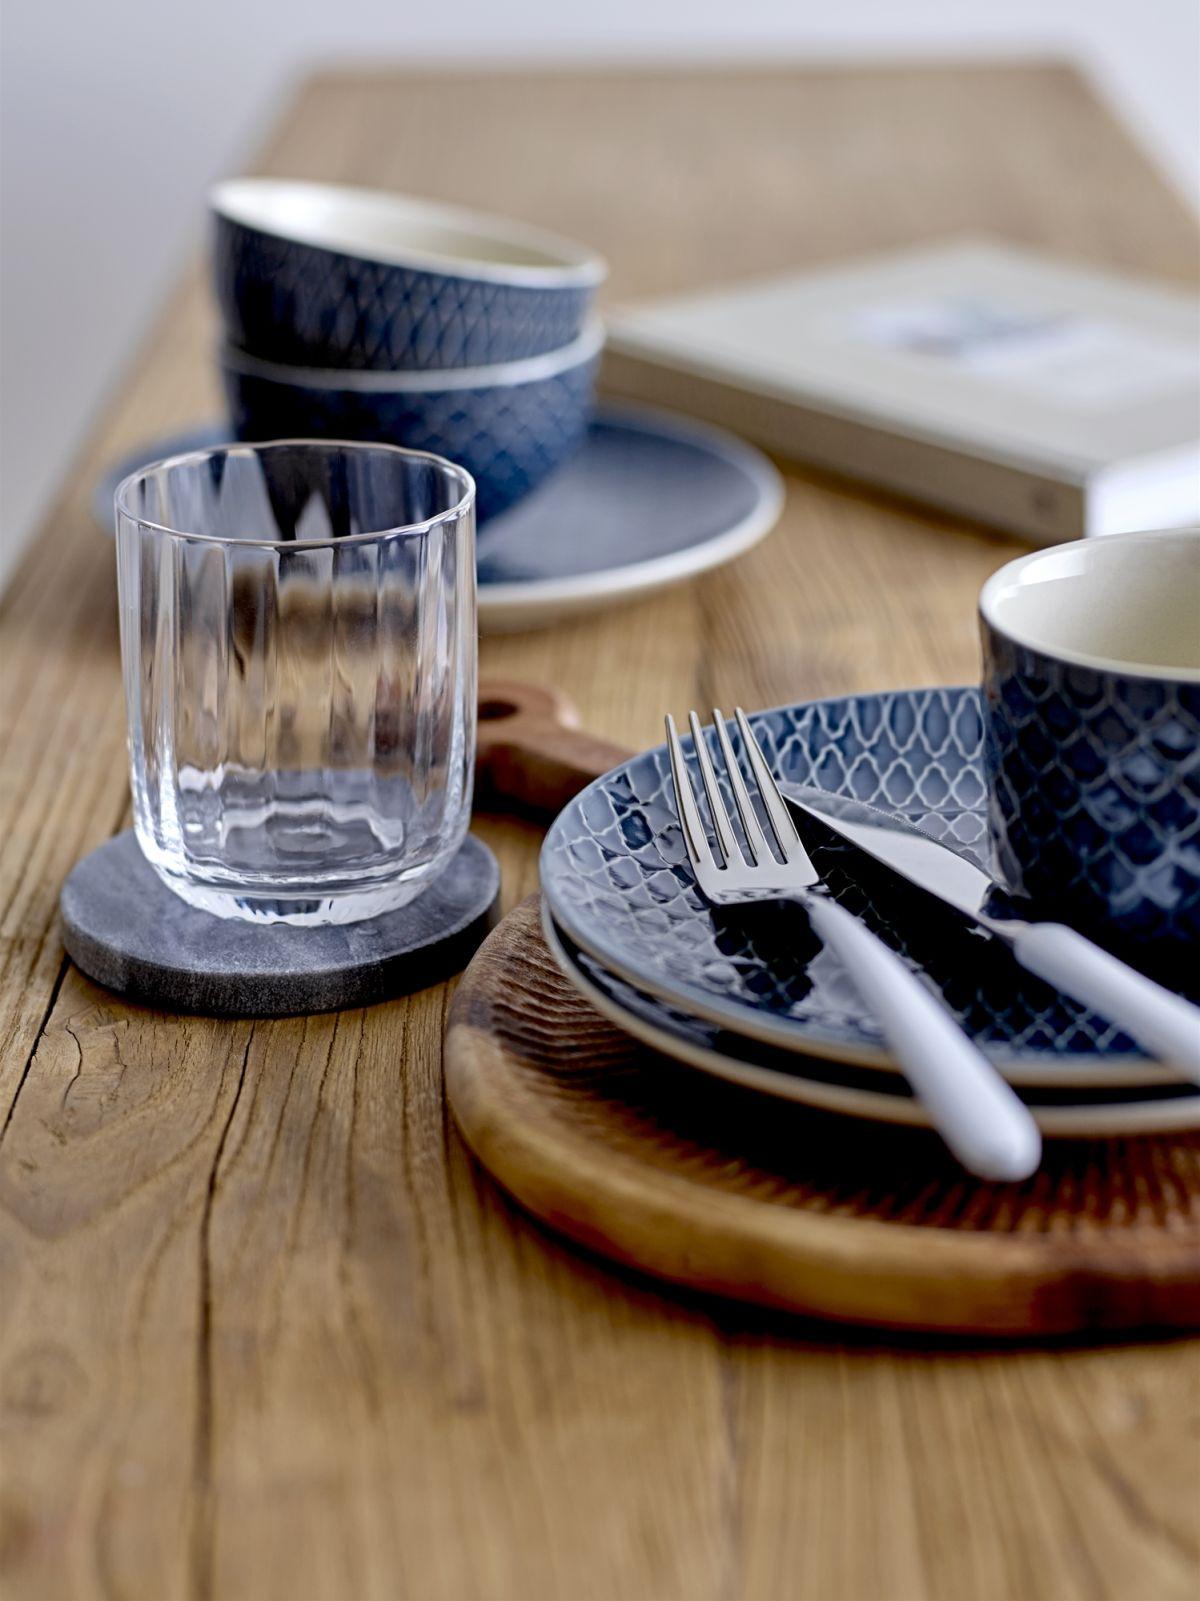 dekoracyjne-akcesoria-kuchenne-ceramika-blomingville-kolekcja-jesien-zima-2018